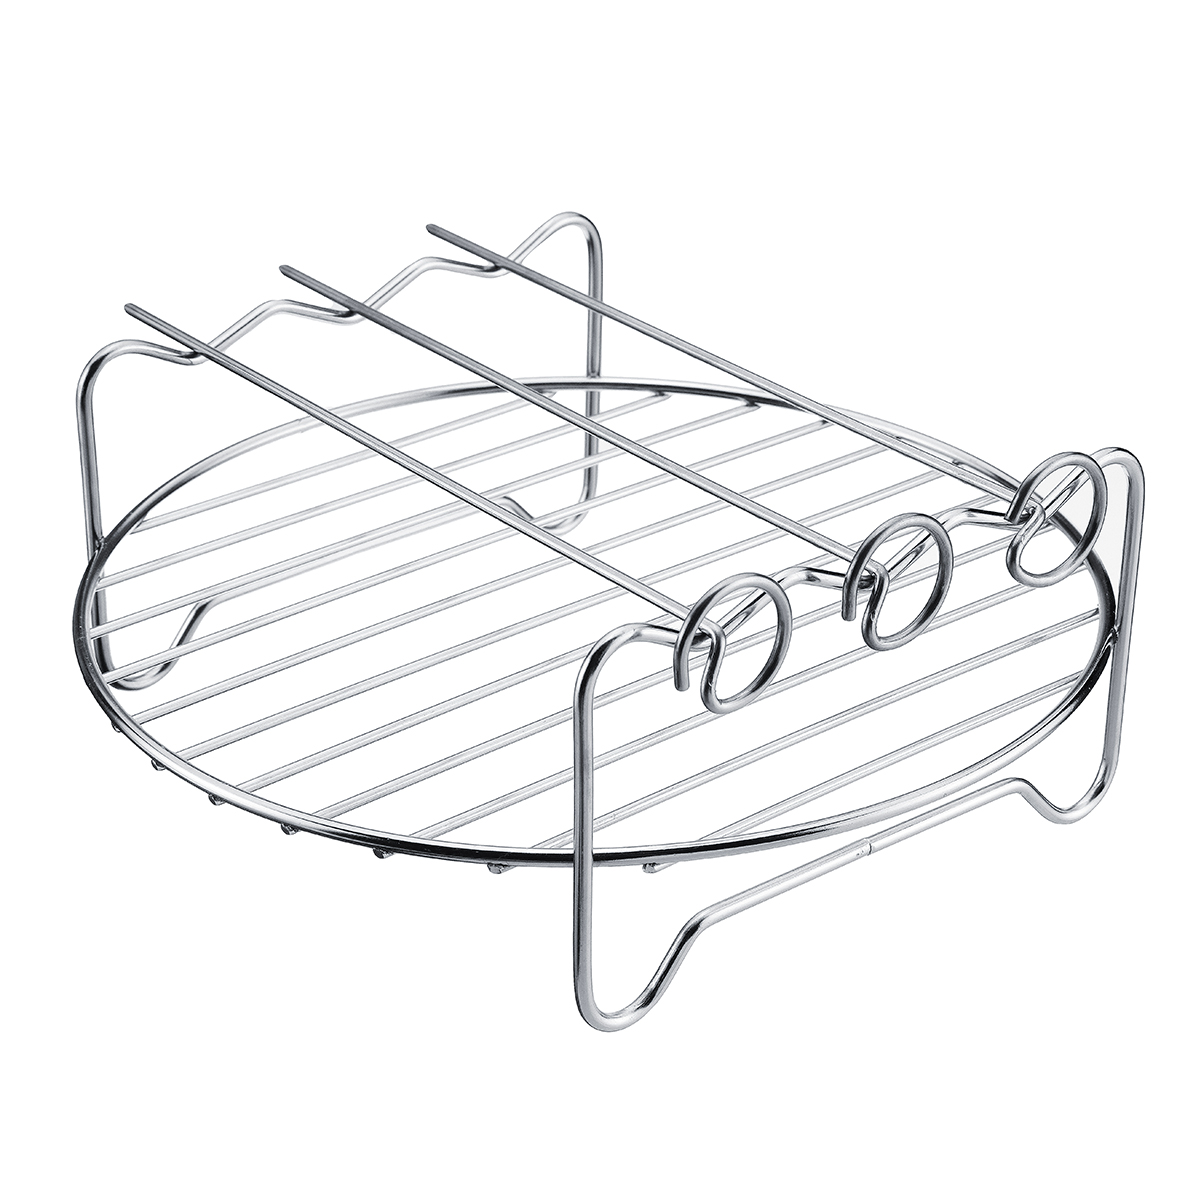 6pcs 9 Inch Non-stick Air Fryer Accessories Set Cake Pizza